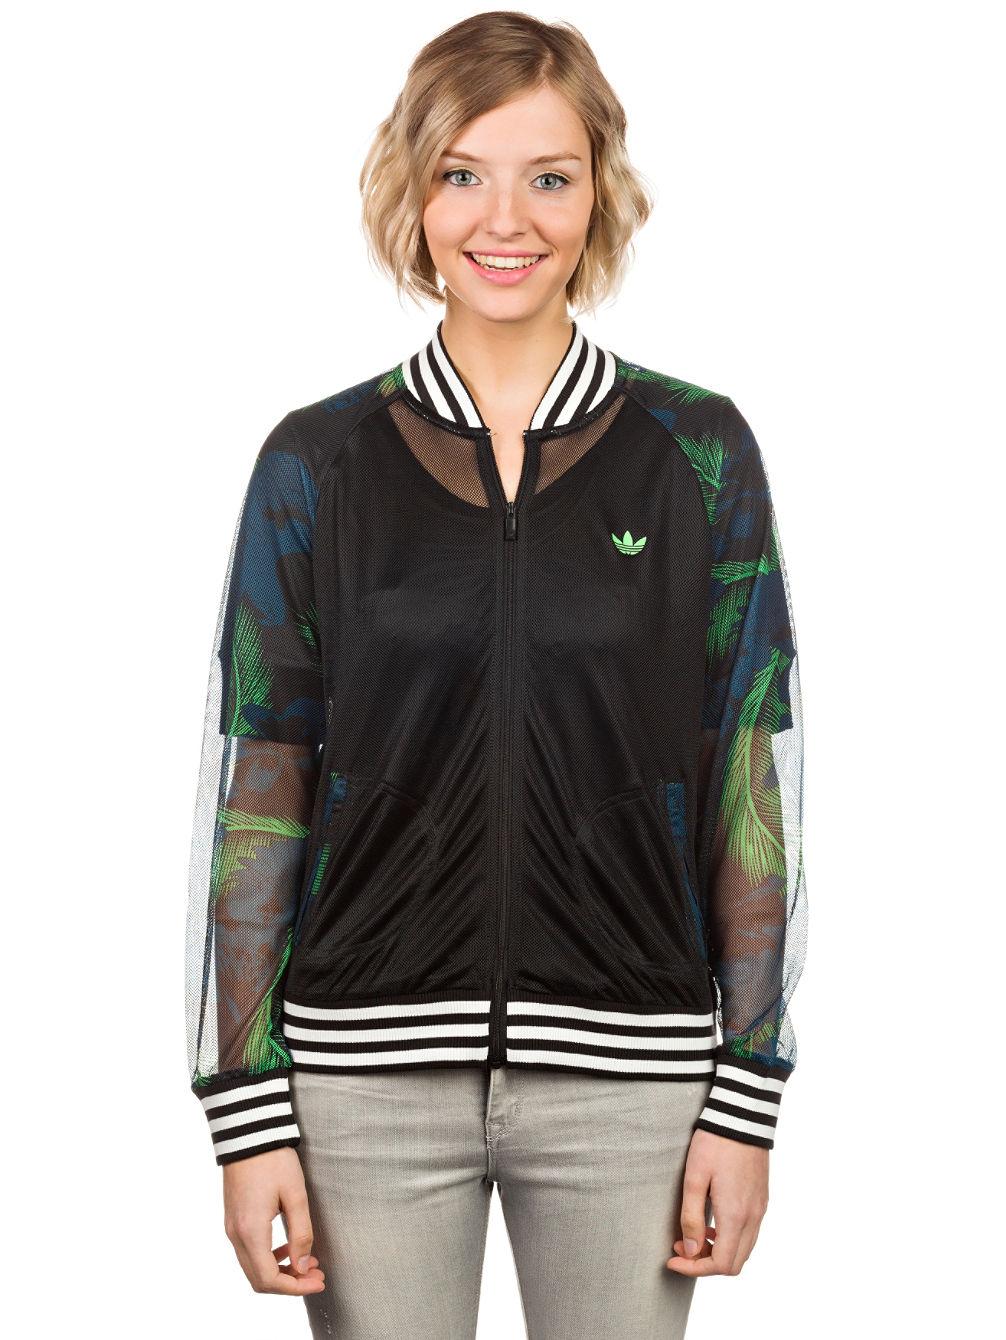 e421fccdb1885 Buy adidas Originals Hawaii Superstar Mesh Track Top Jacket online ...